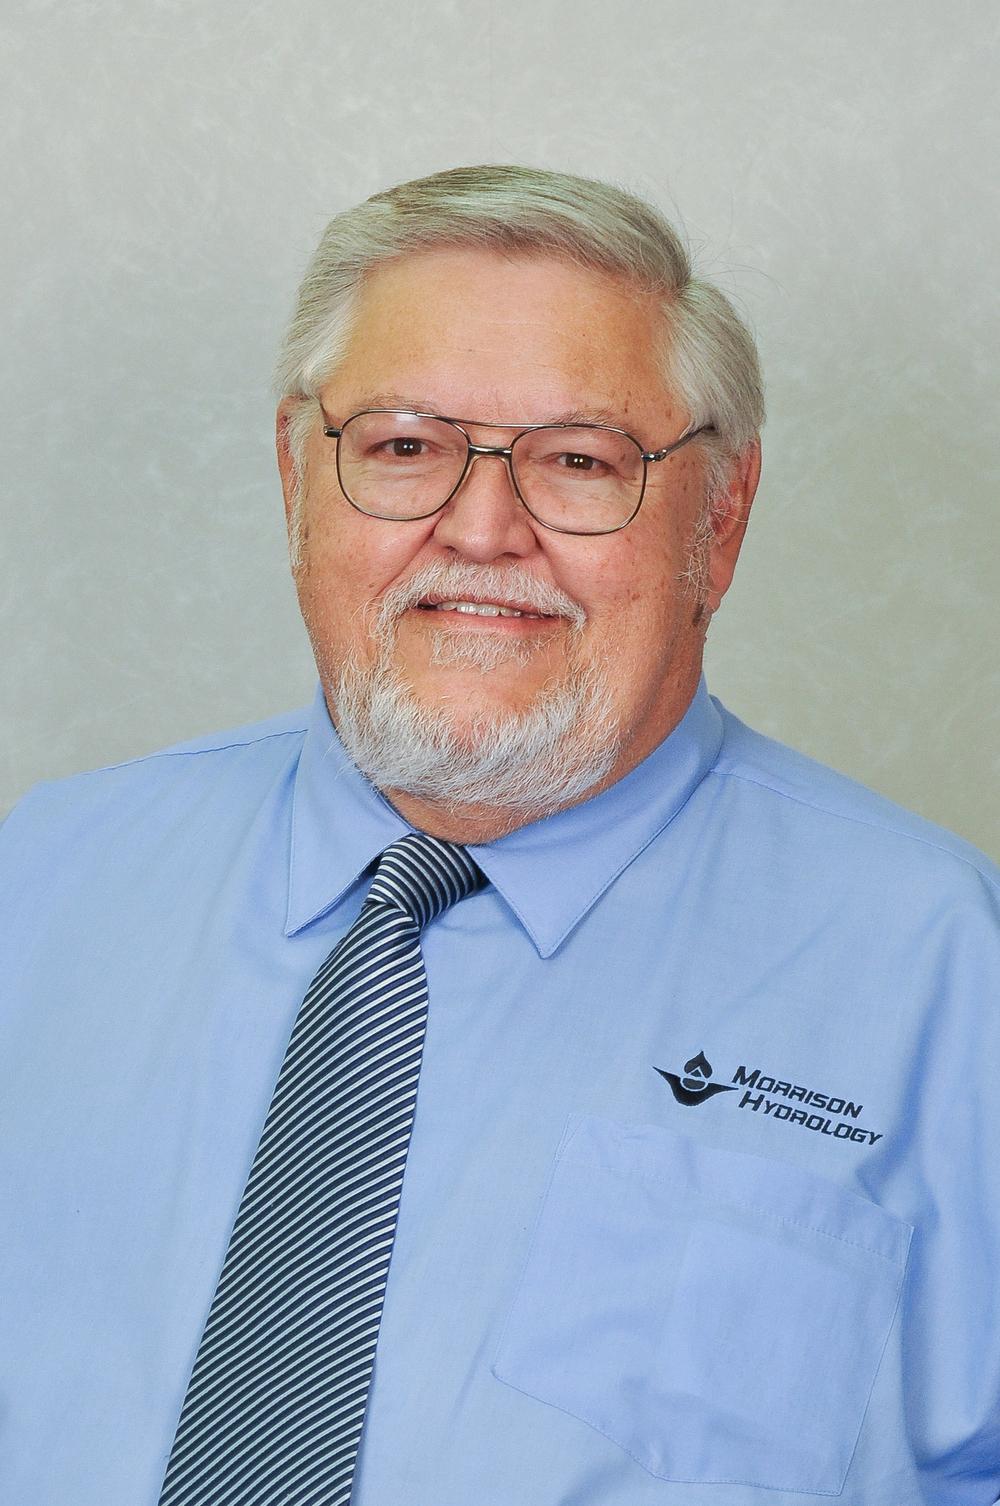 Ron Morrison, PE, CFM President, Hydrology Division rmorrison@bspengineers.com